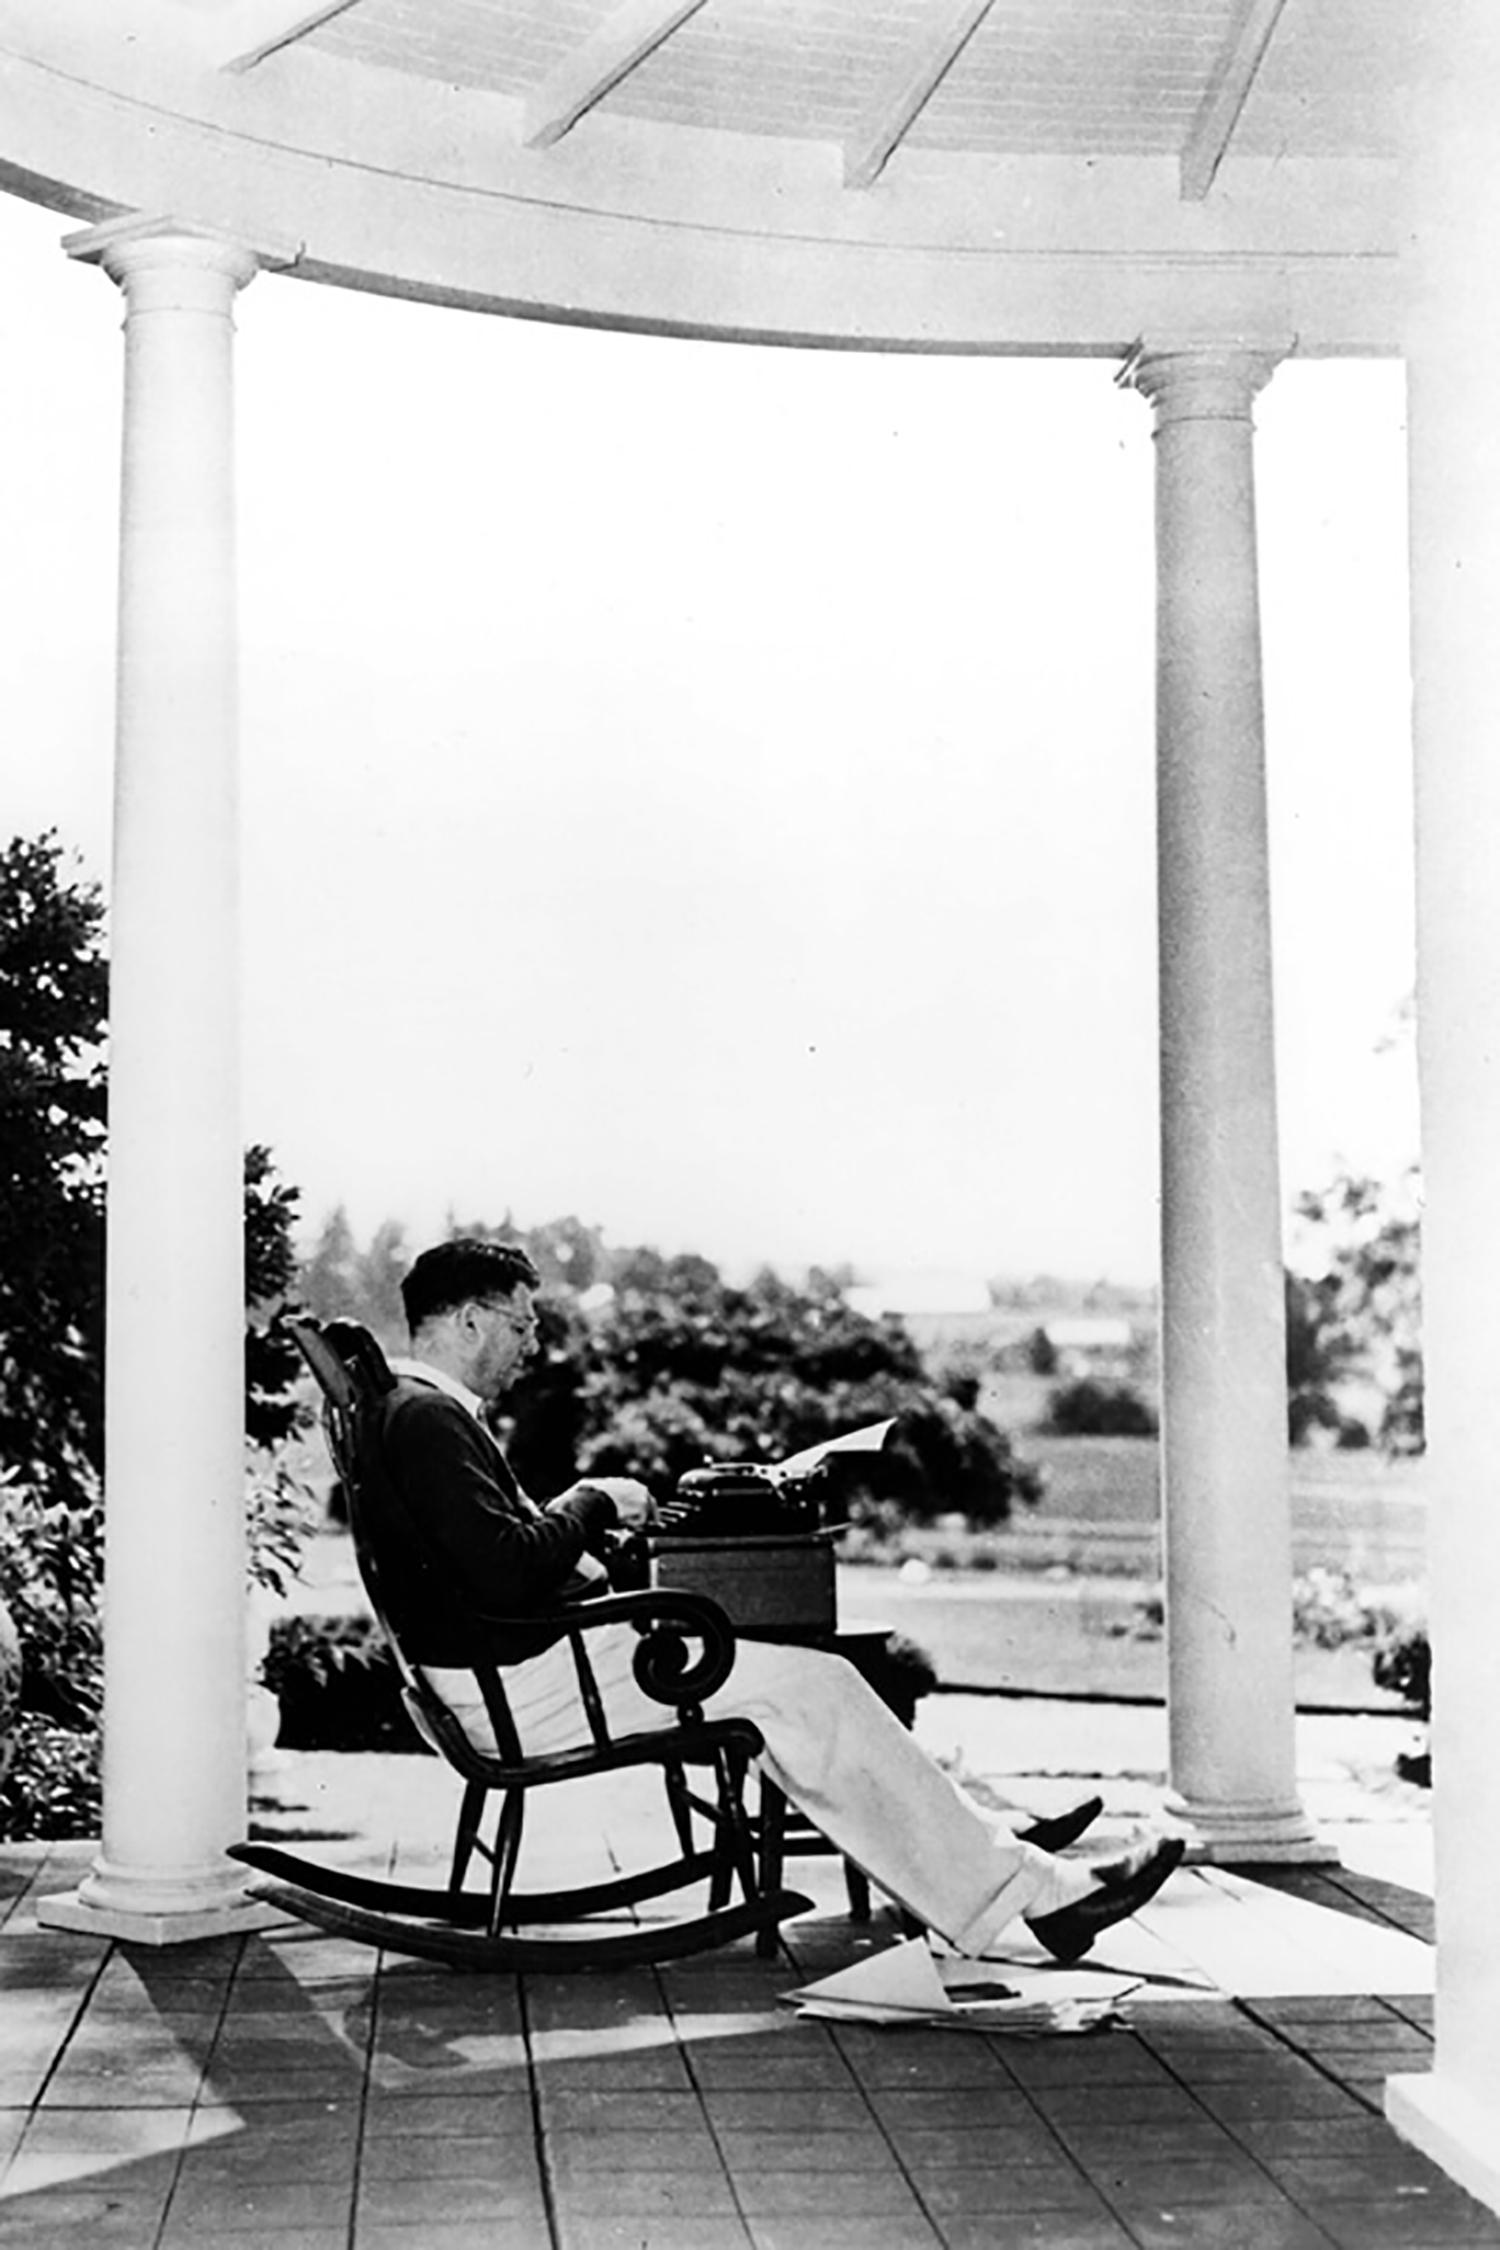 rocking-chair-porch-1944.jpg